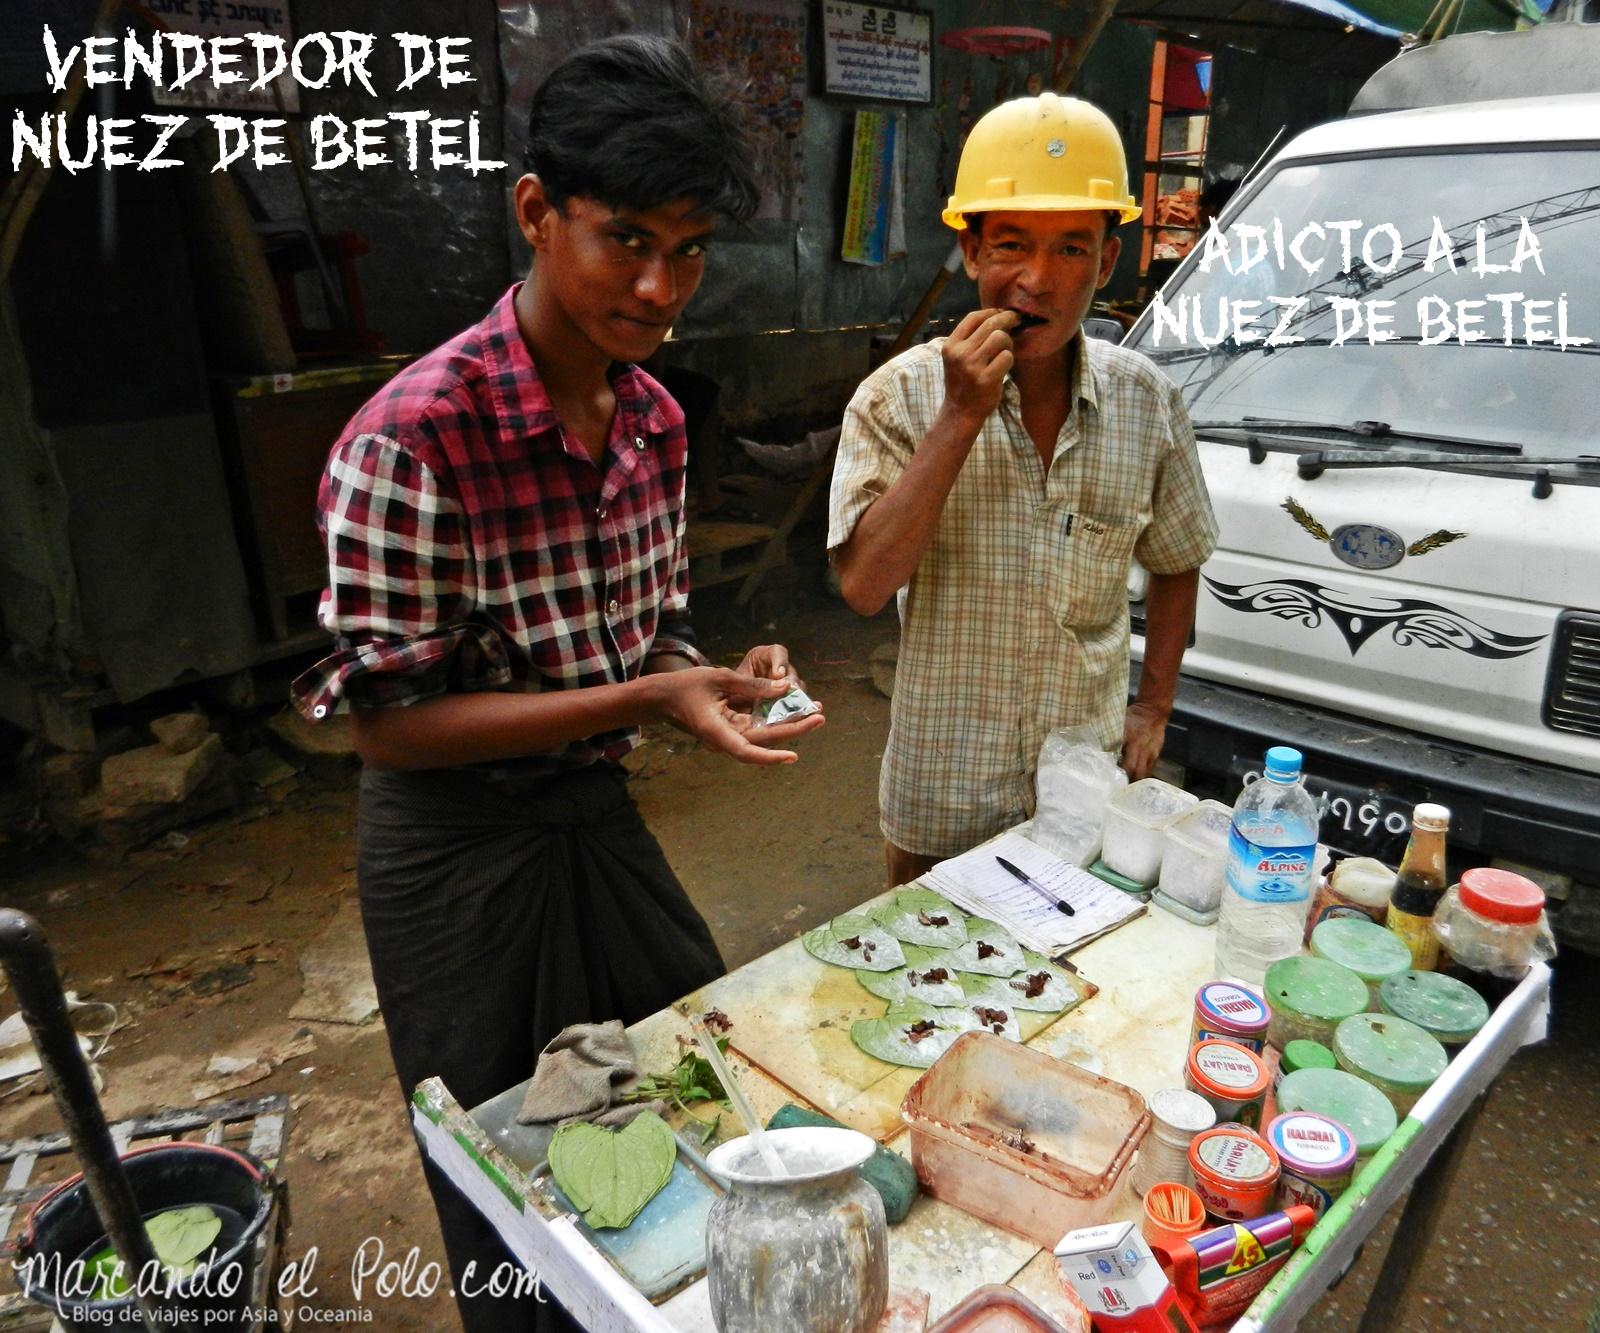 Vendedor betel - Curiosidades Myanmar